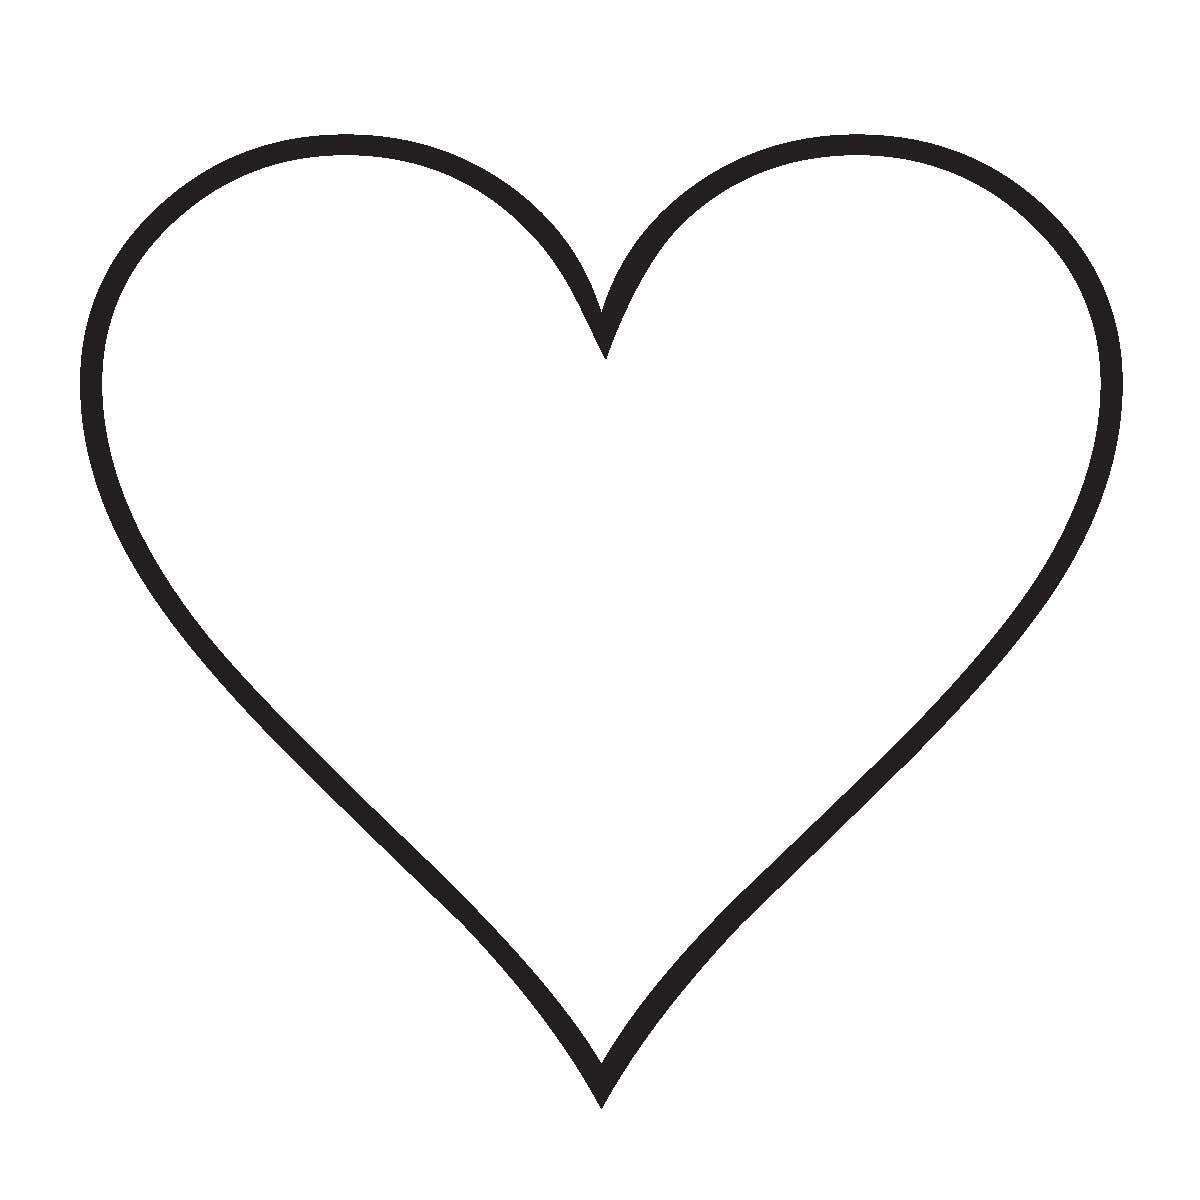 Heart Template Image By Maysa Mahmoud On Love